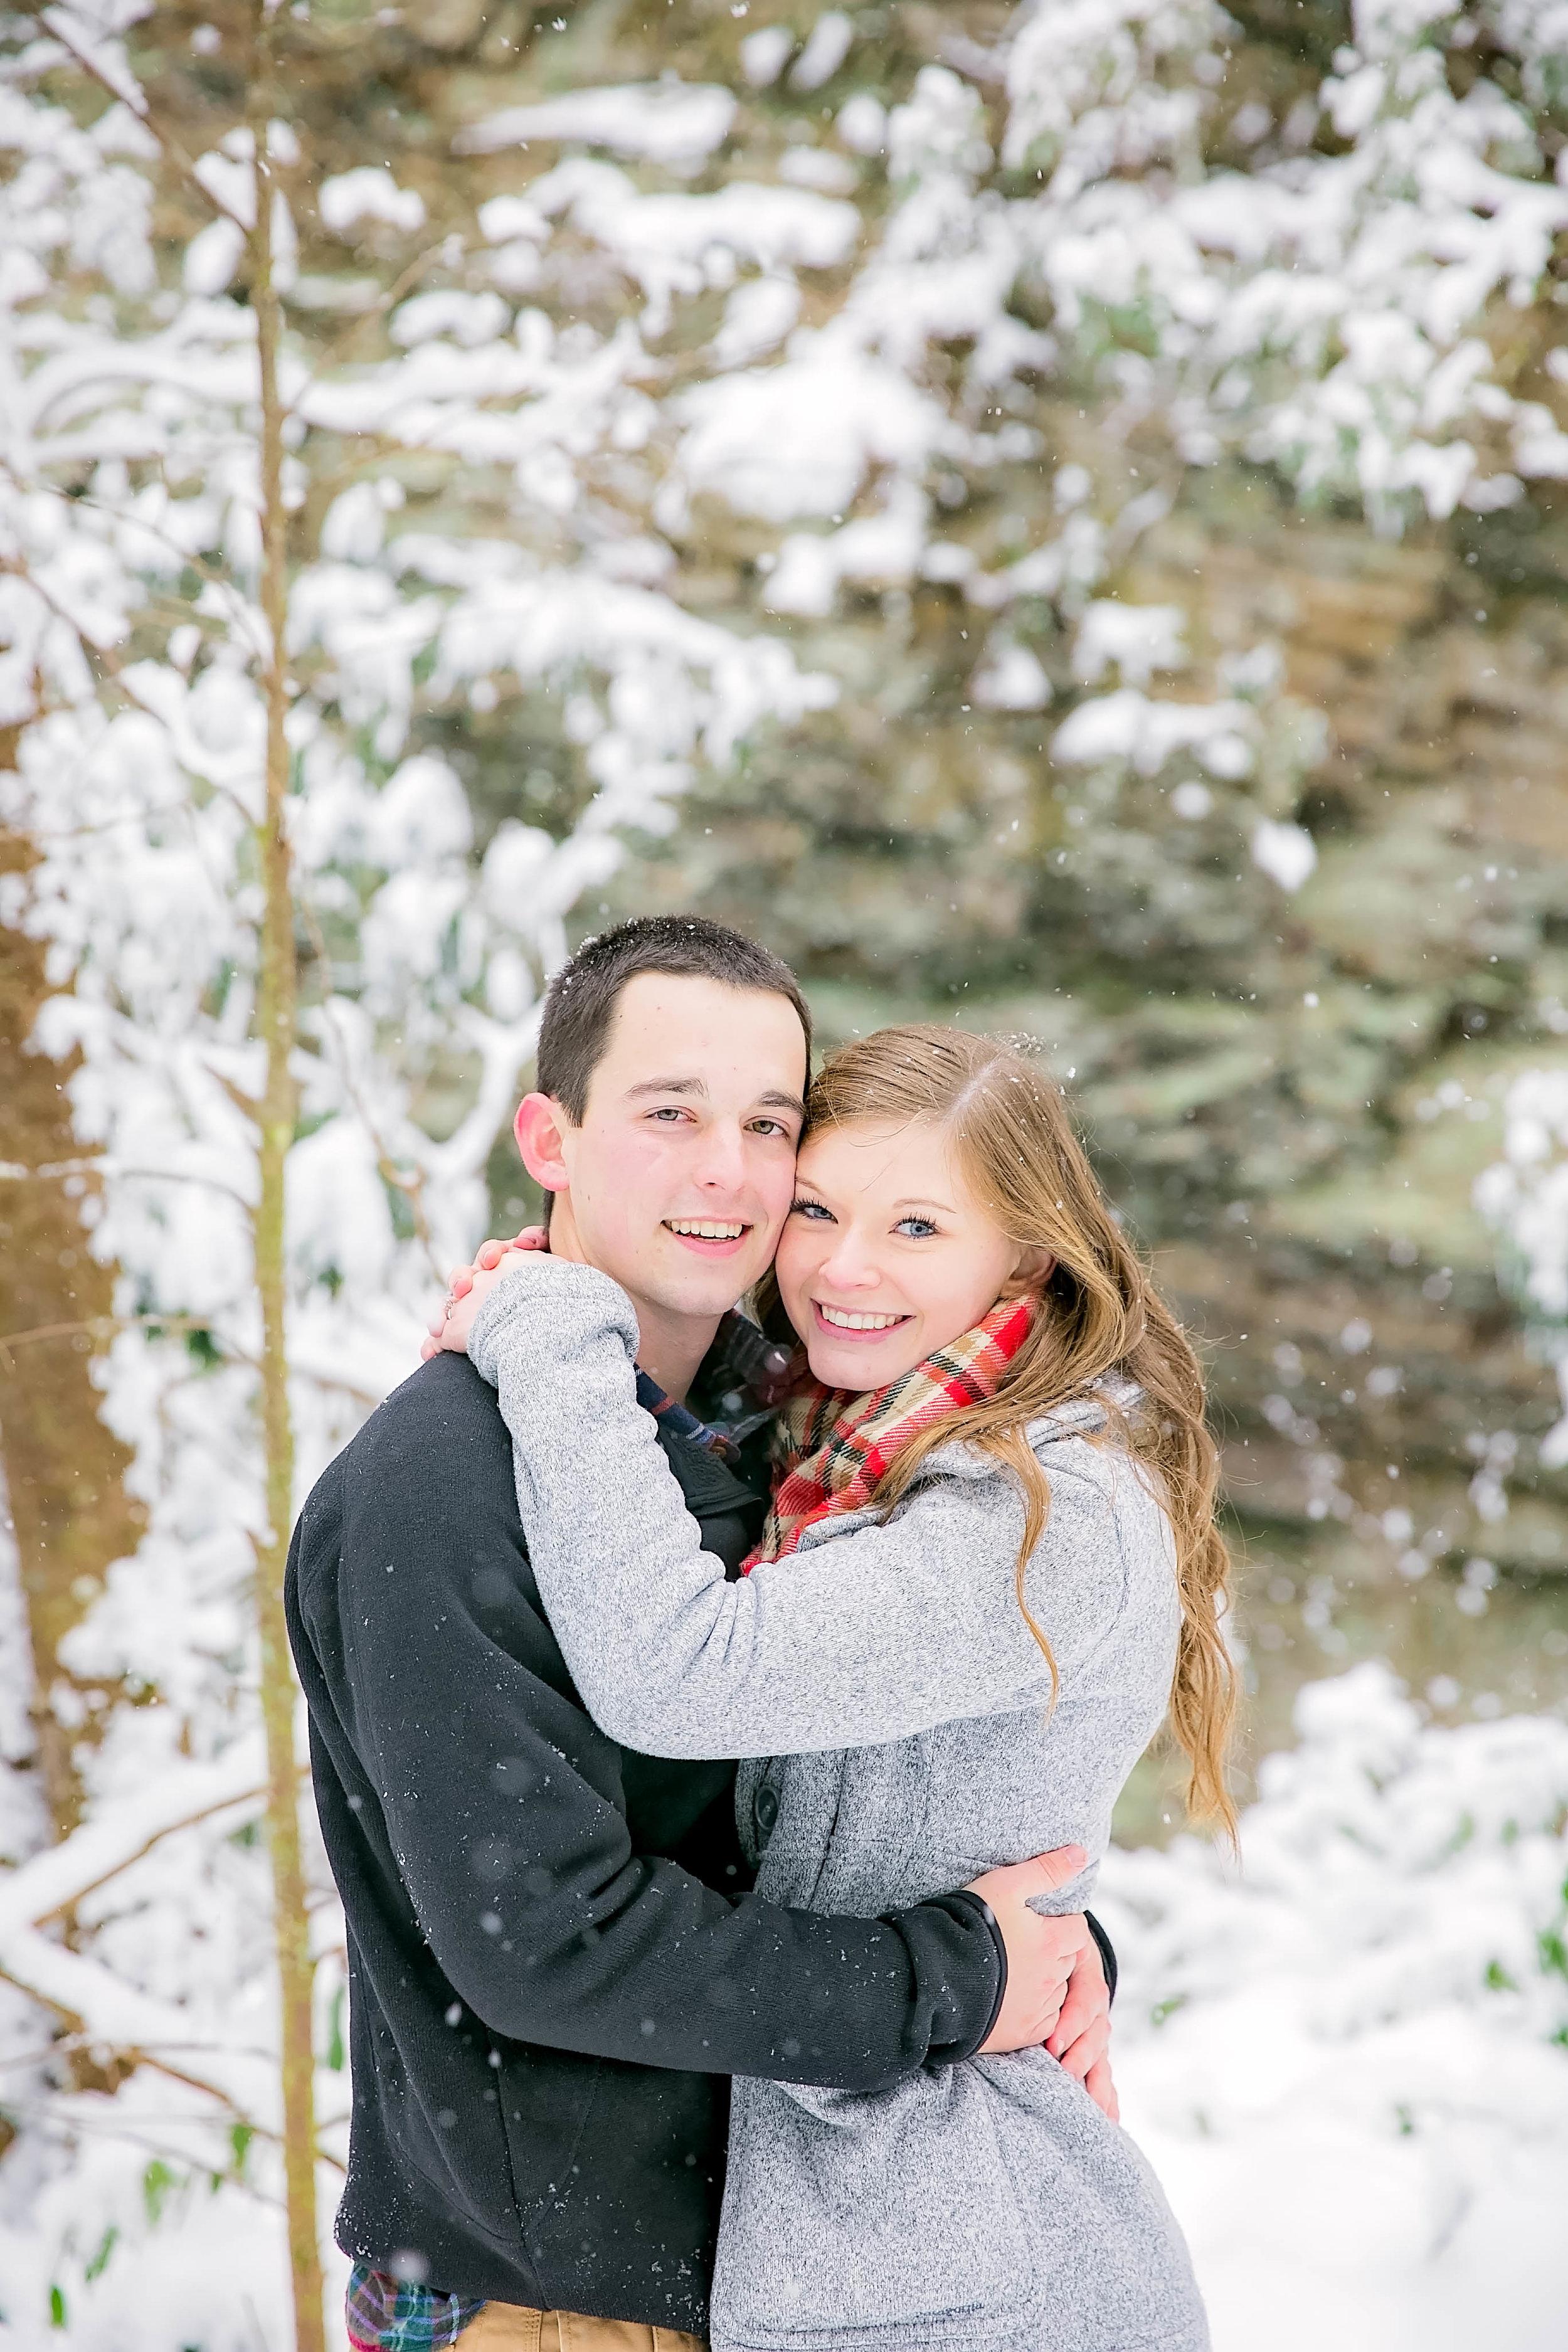 Romantic snowy couple session